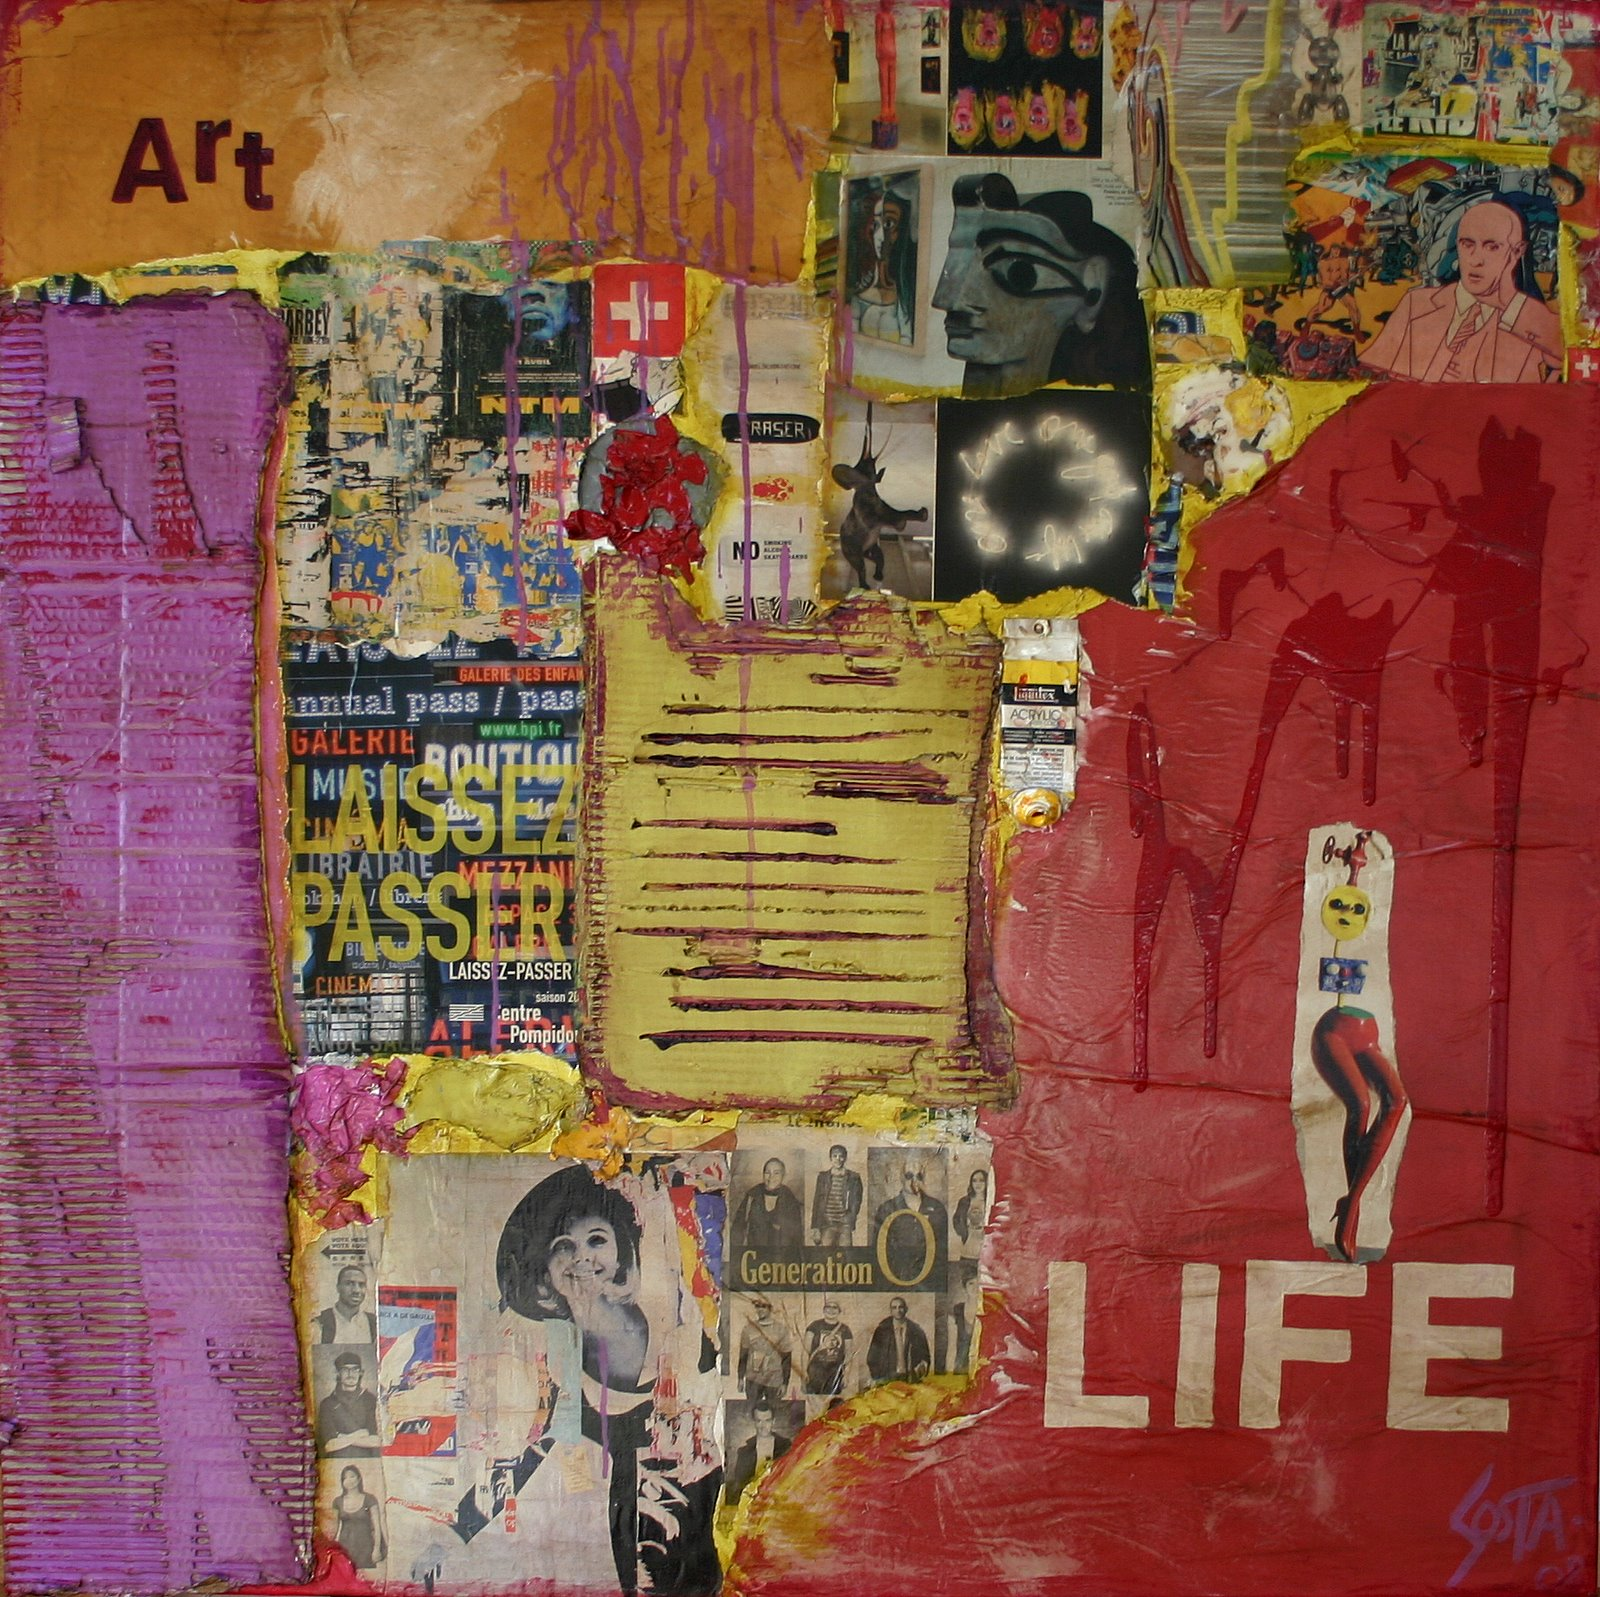 Tableau Contemporain, Art LIFE. Sophie Costa, artiste peintre.